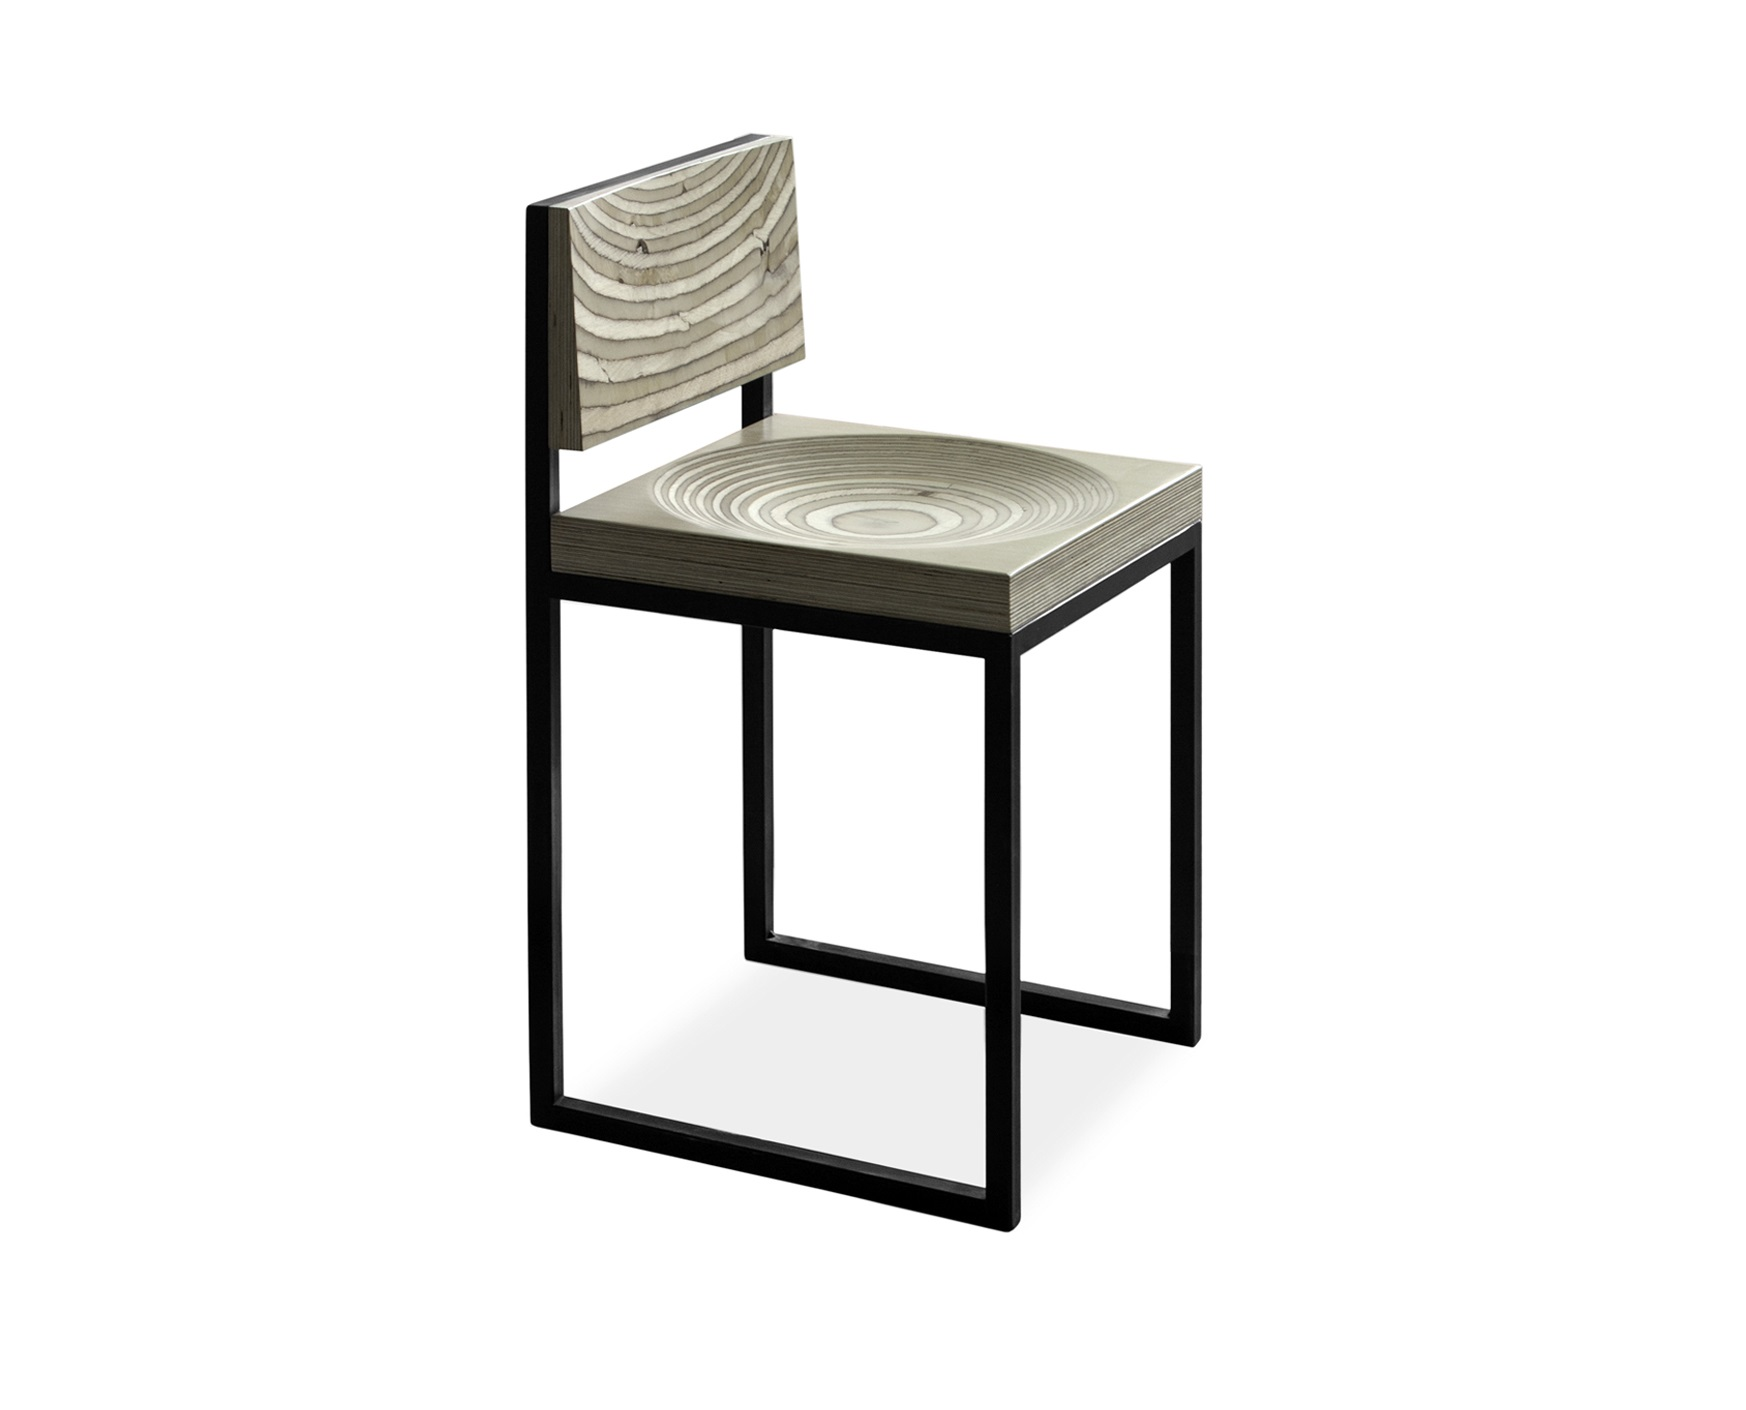 Кухонный стул Archpole 15429404 от thefurnish